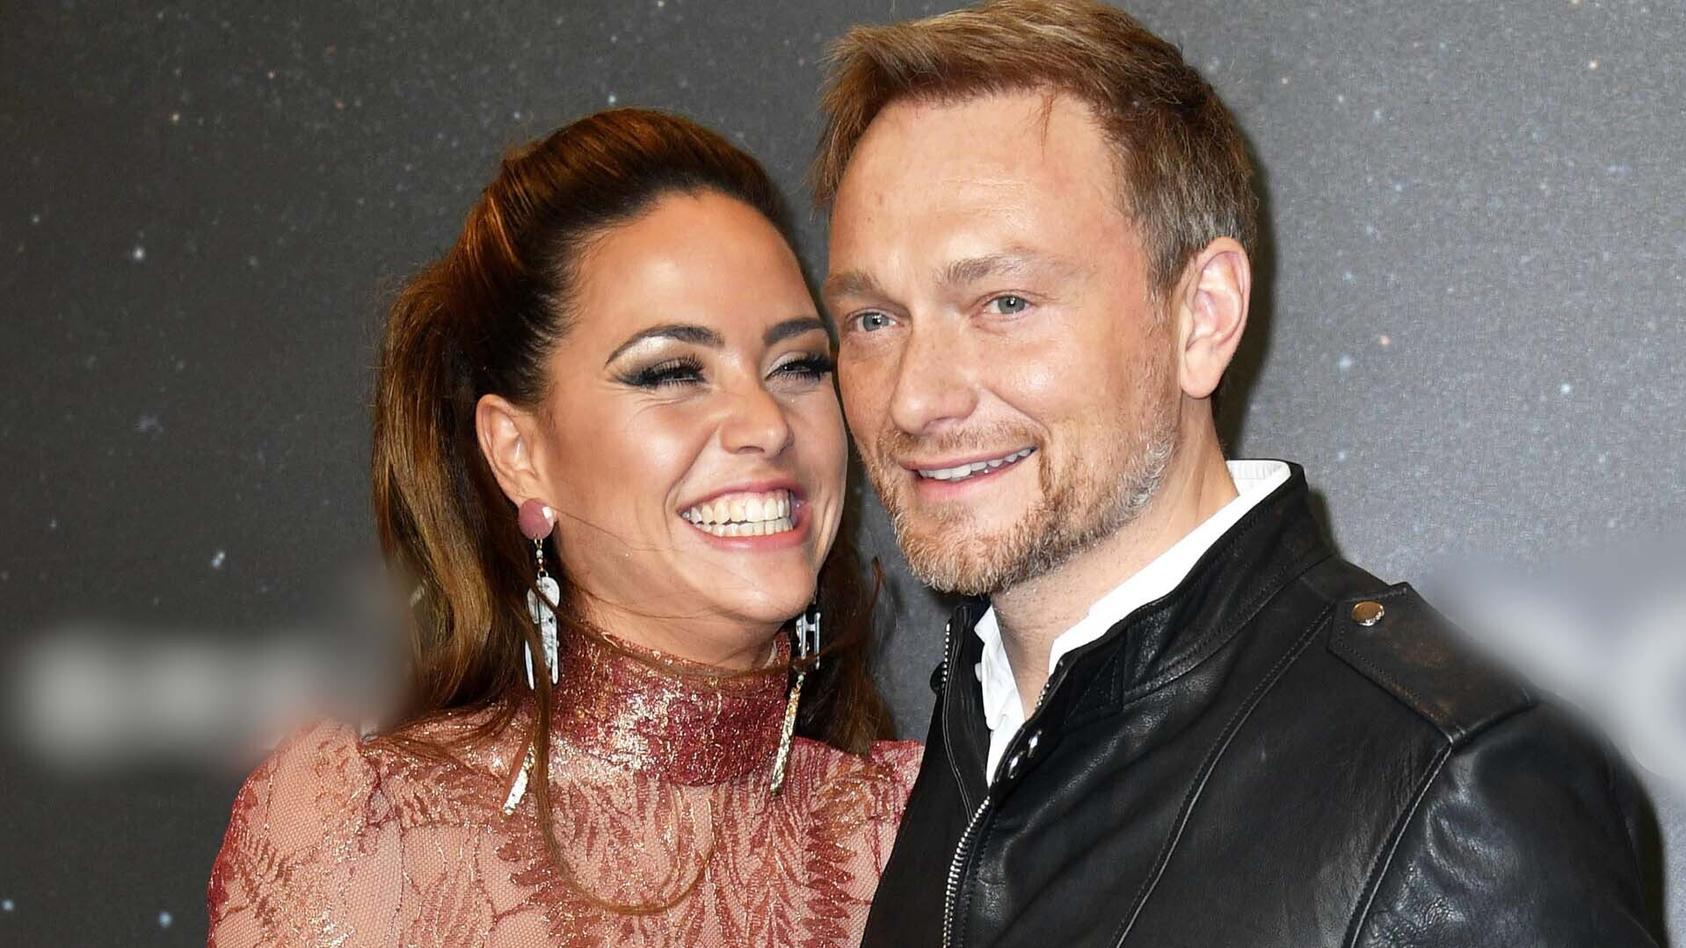 RTL-Reporterin heiratet FDP-Chef - Wie sich Franca Lehfeldt & Christian Lindner verlobt haben